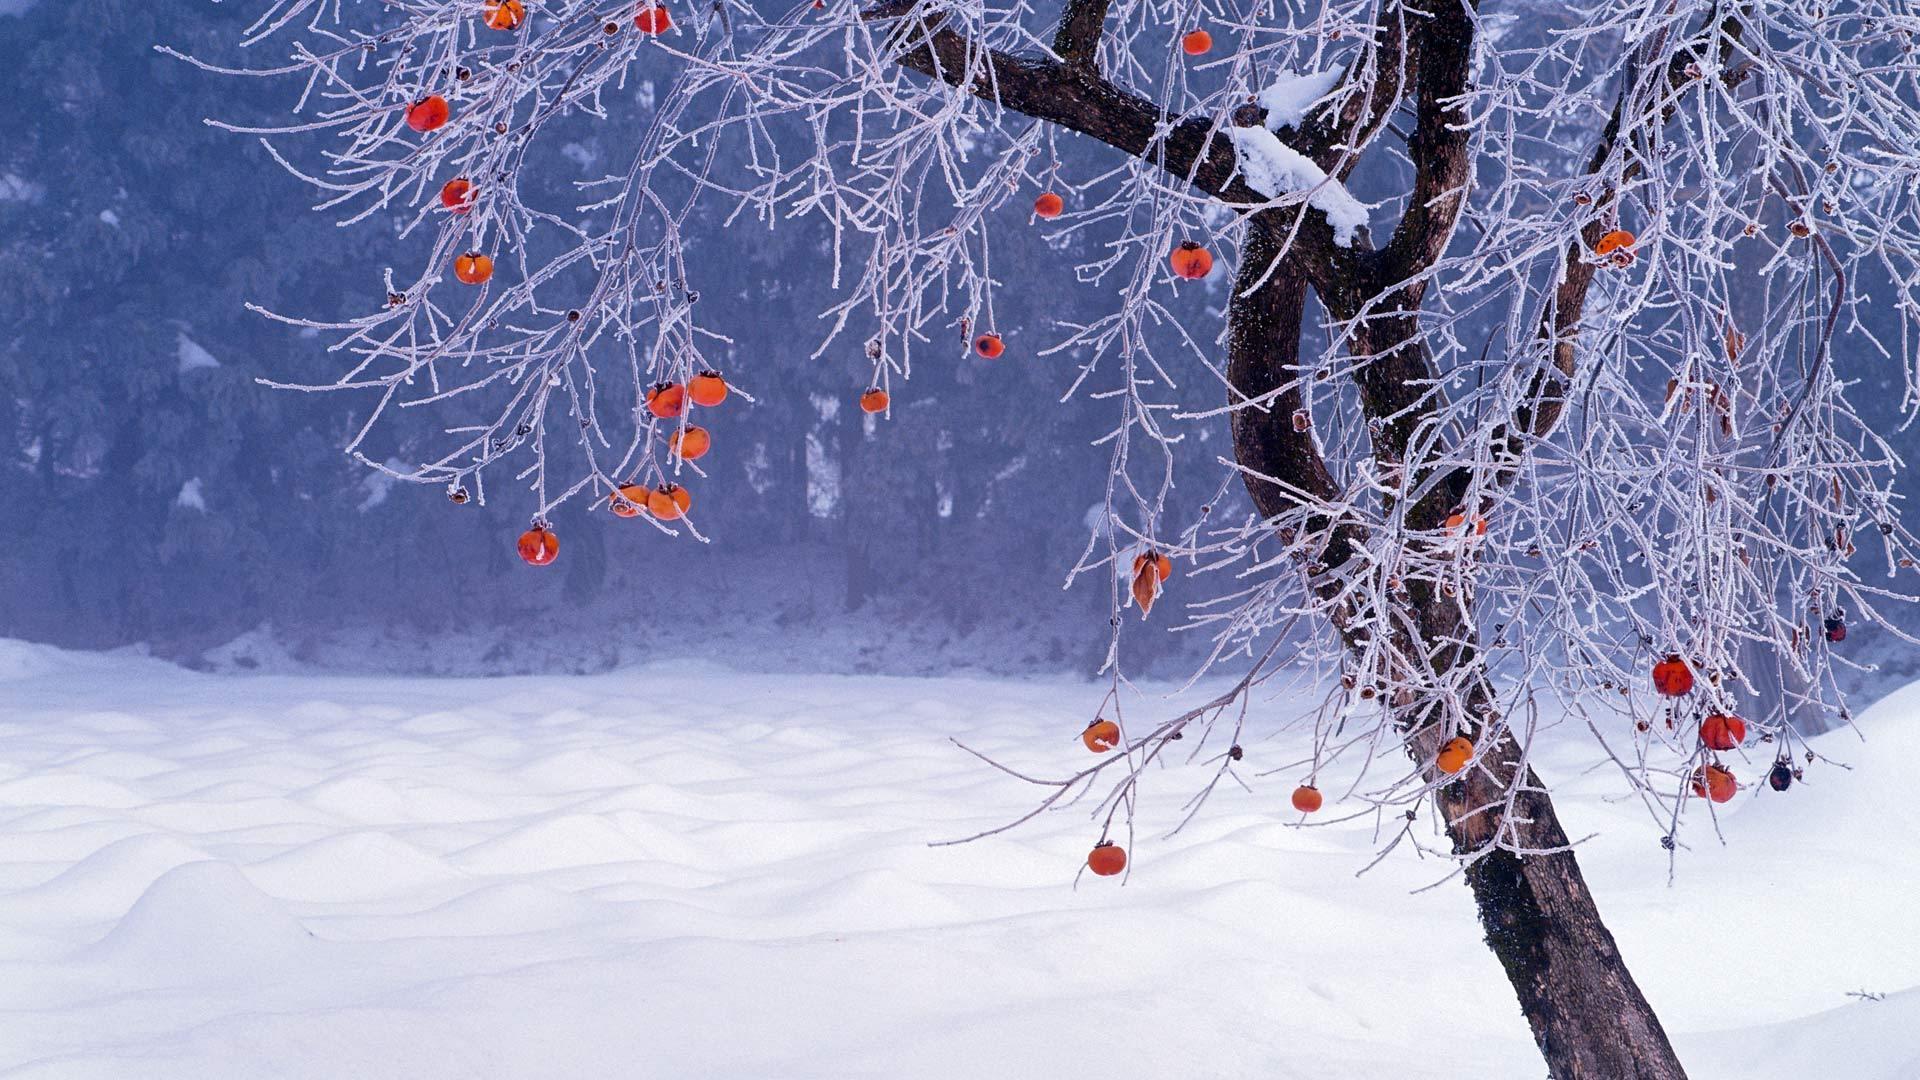 Desktop hintergrundbild kostenlos winter